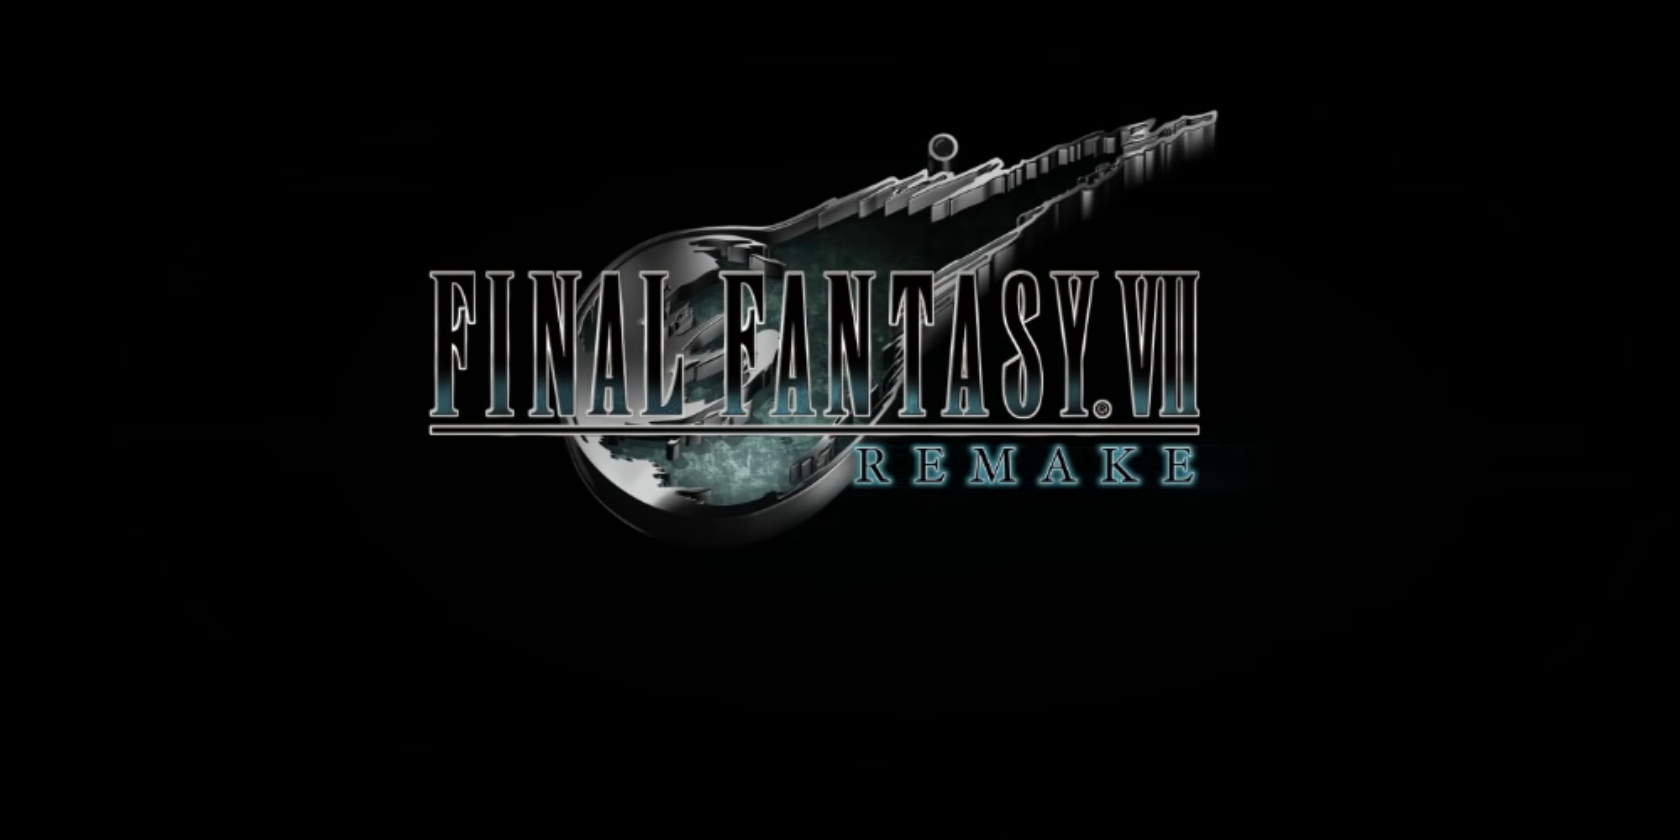 Square Enix Reveals Final Fantasy VII Remake Trailer